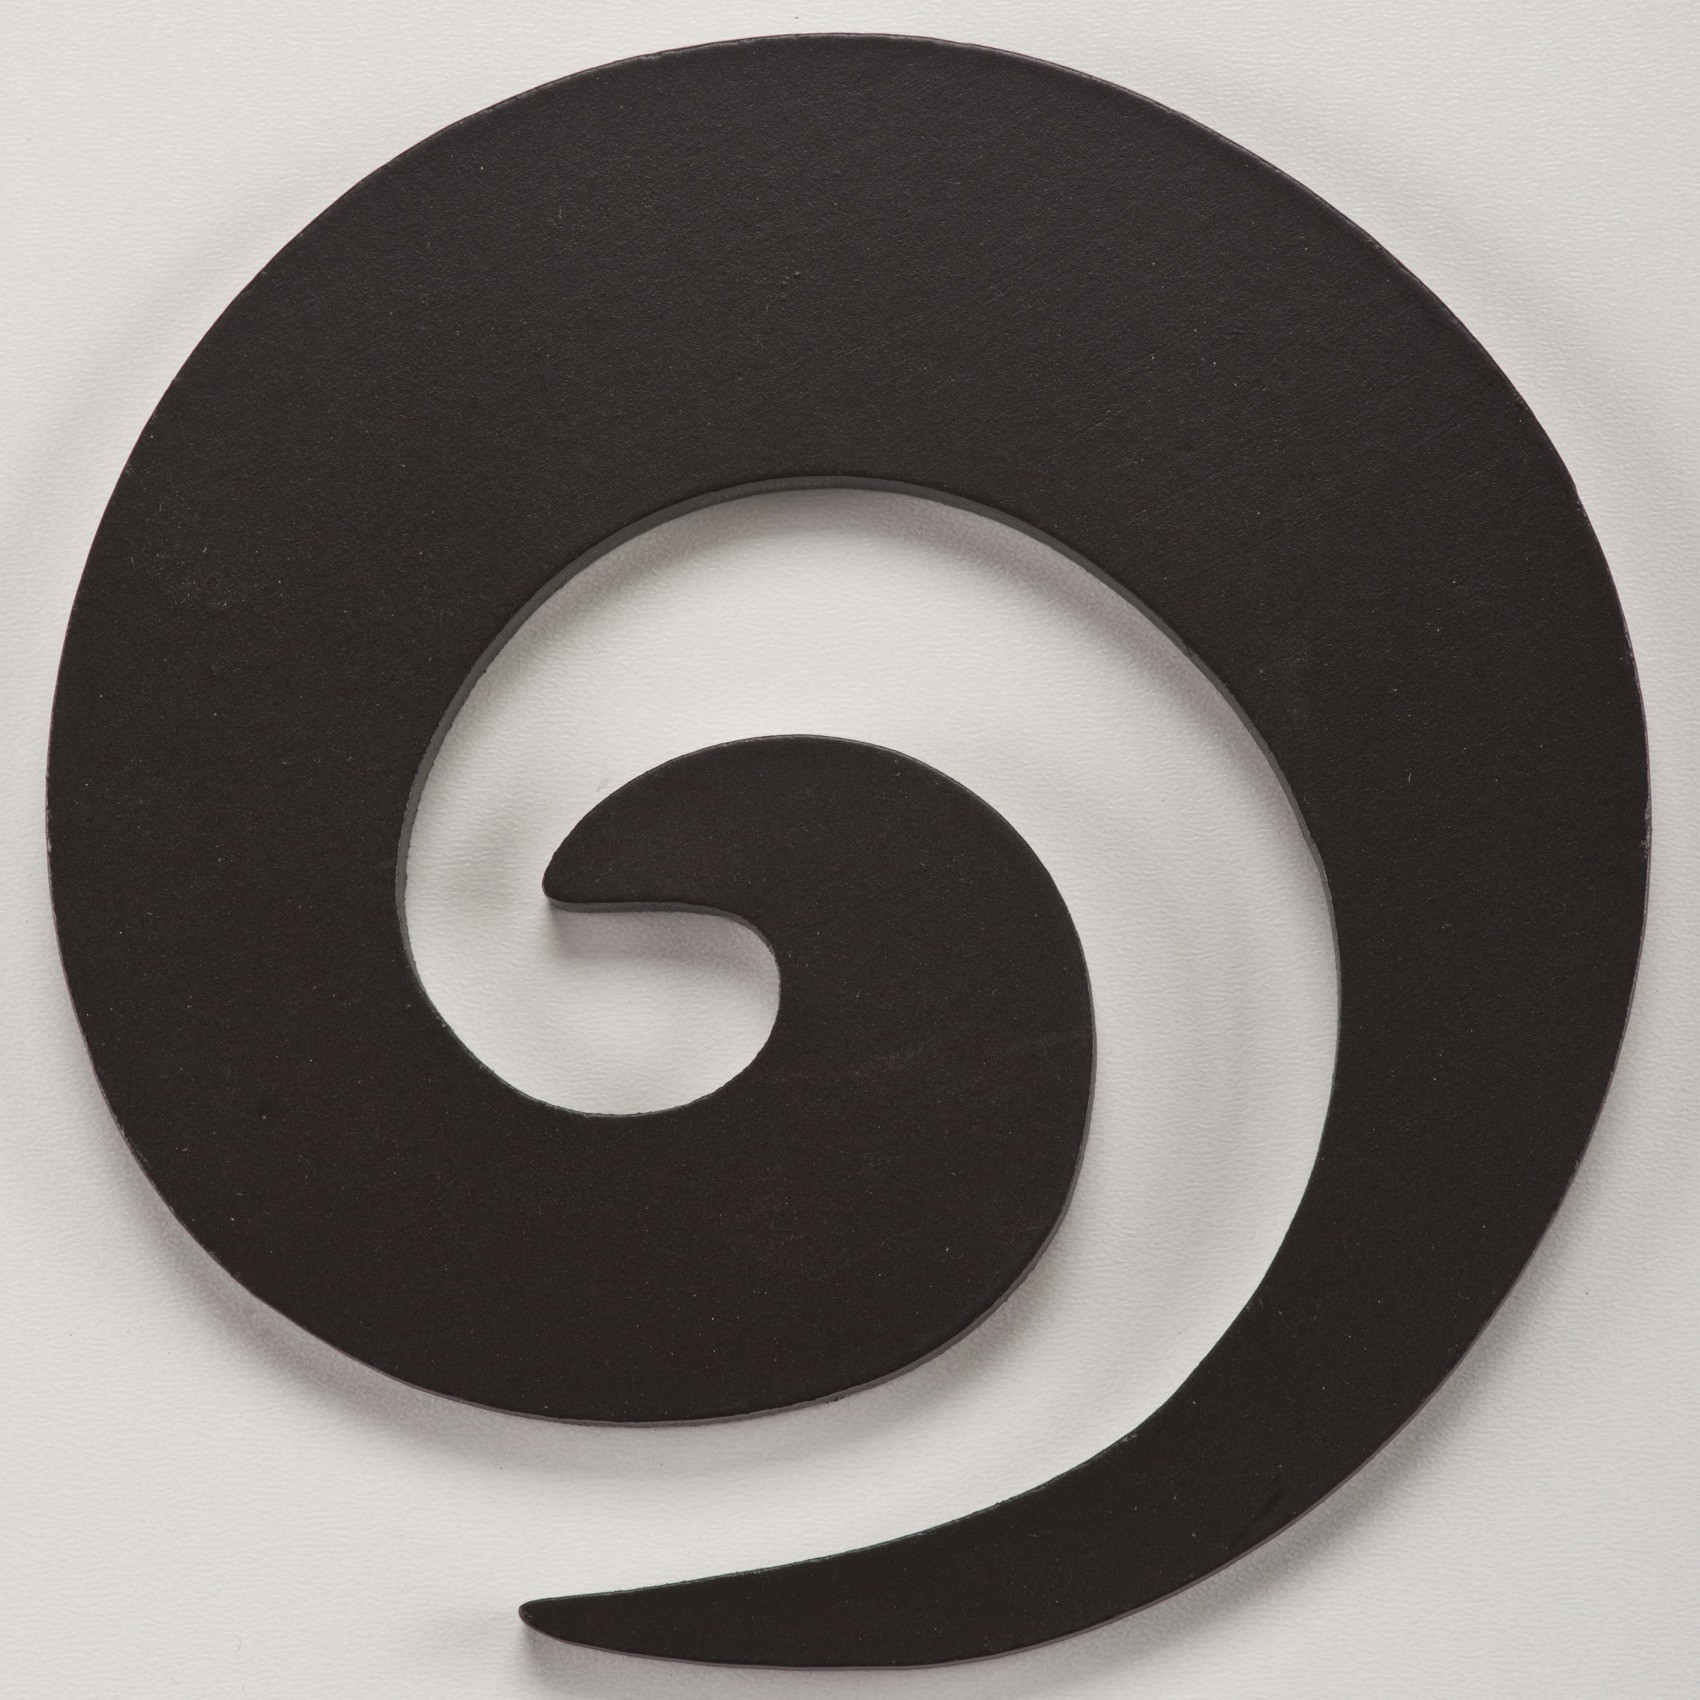 SLIMAK DEKOR 4271 - Brązowy